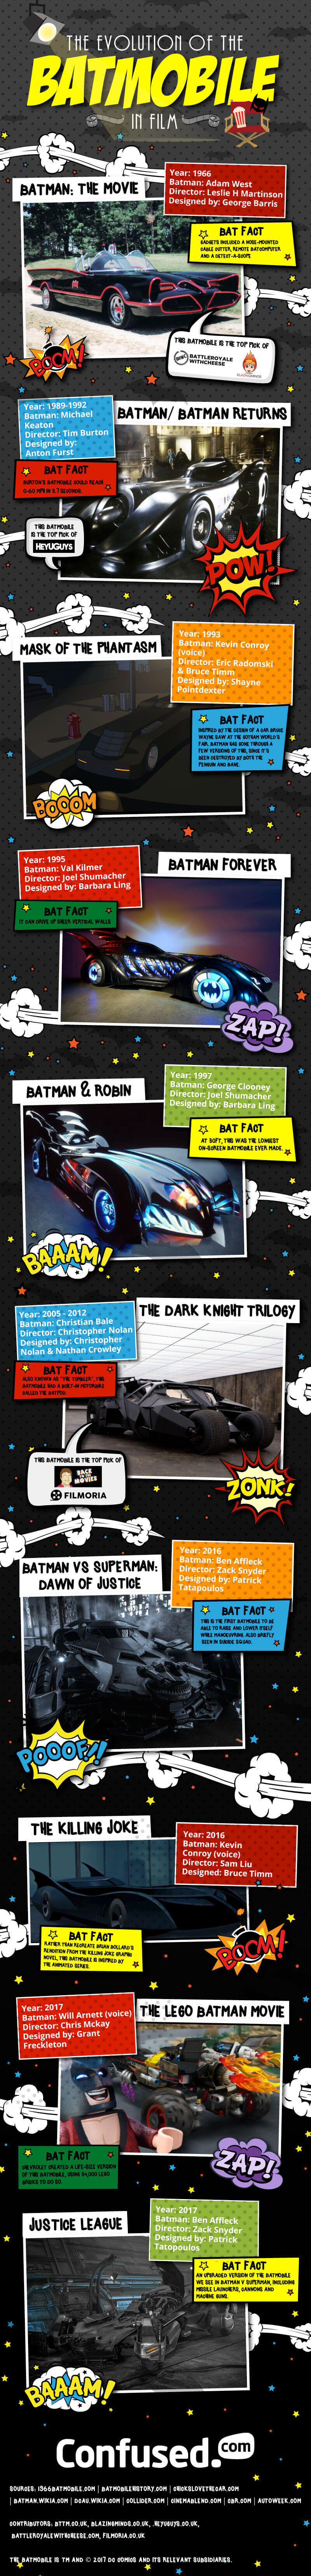 batmobile-evolution-infographic